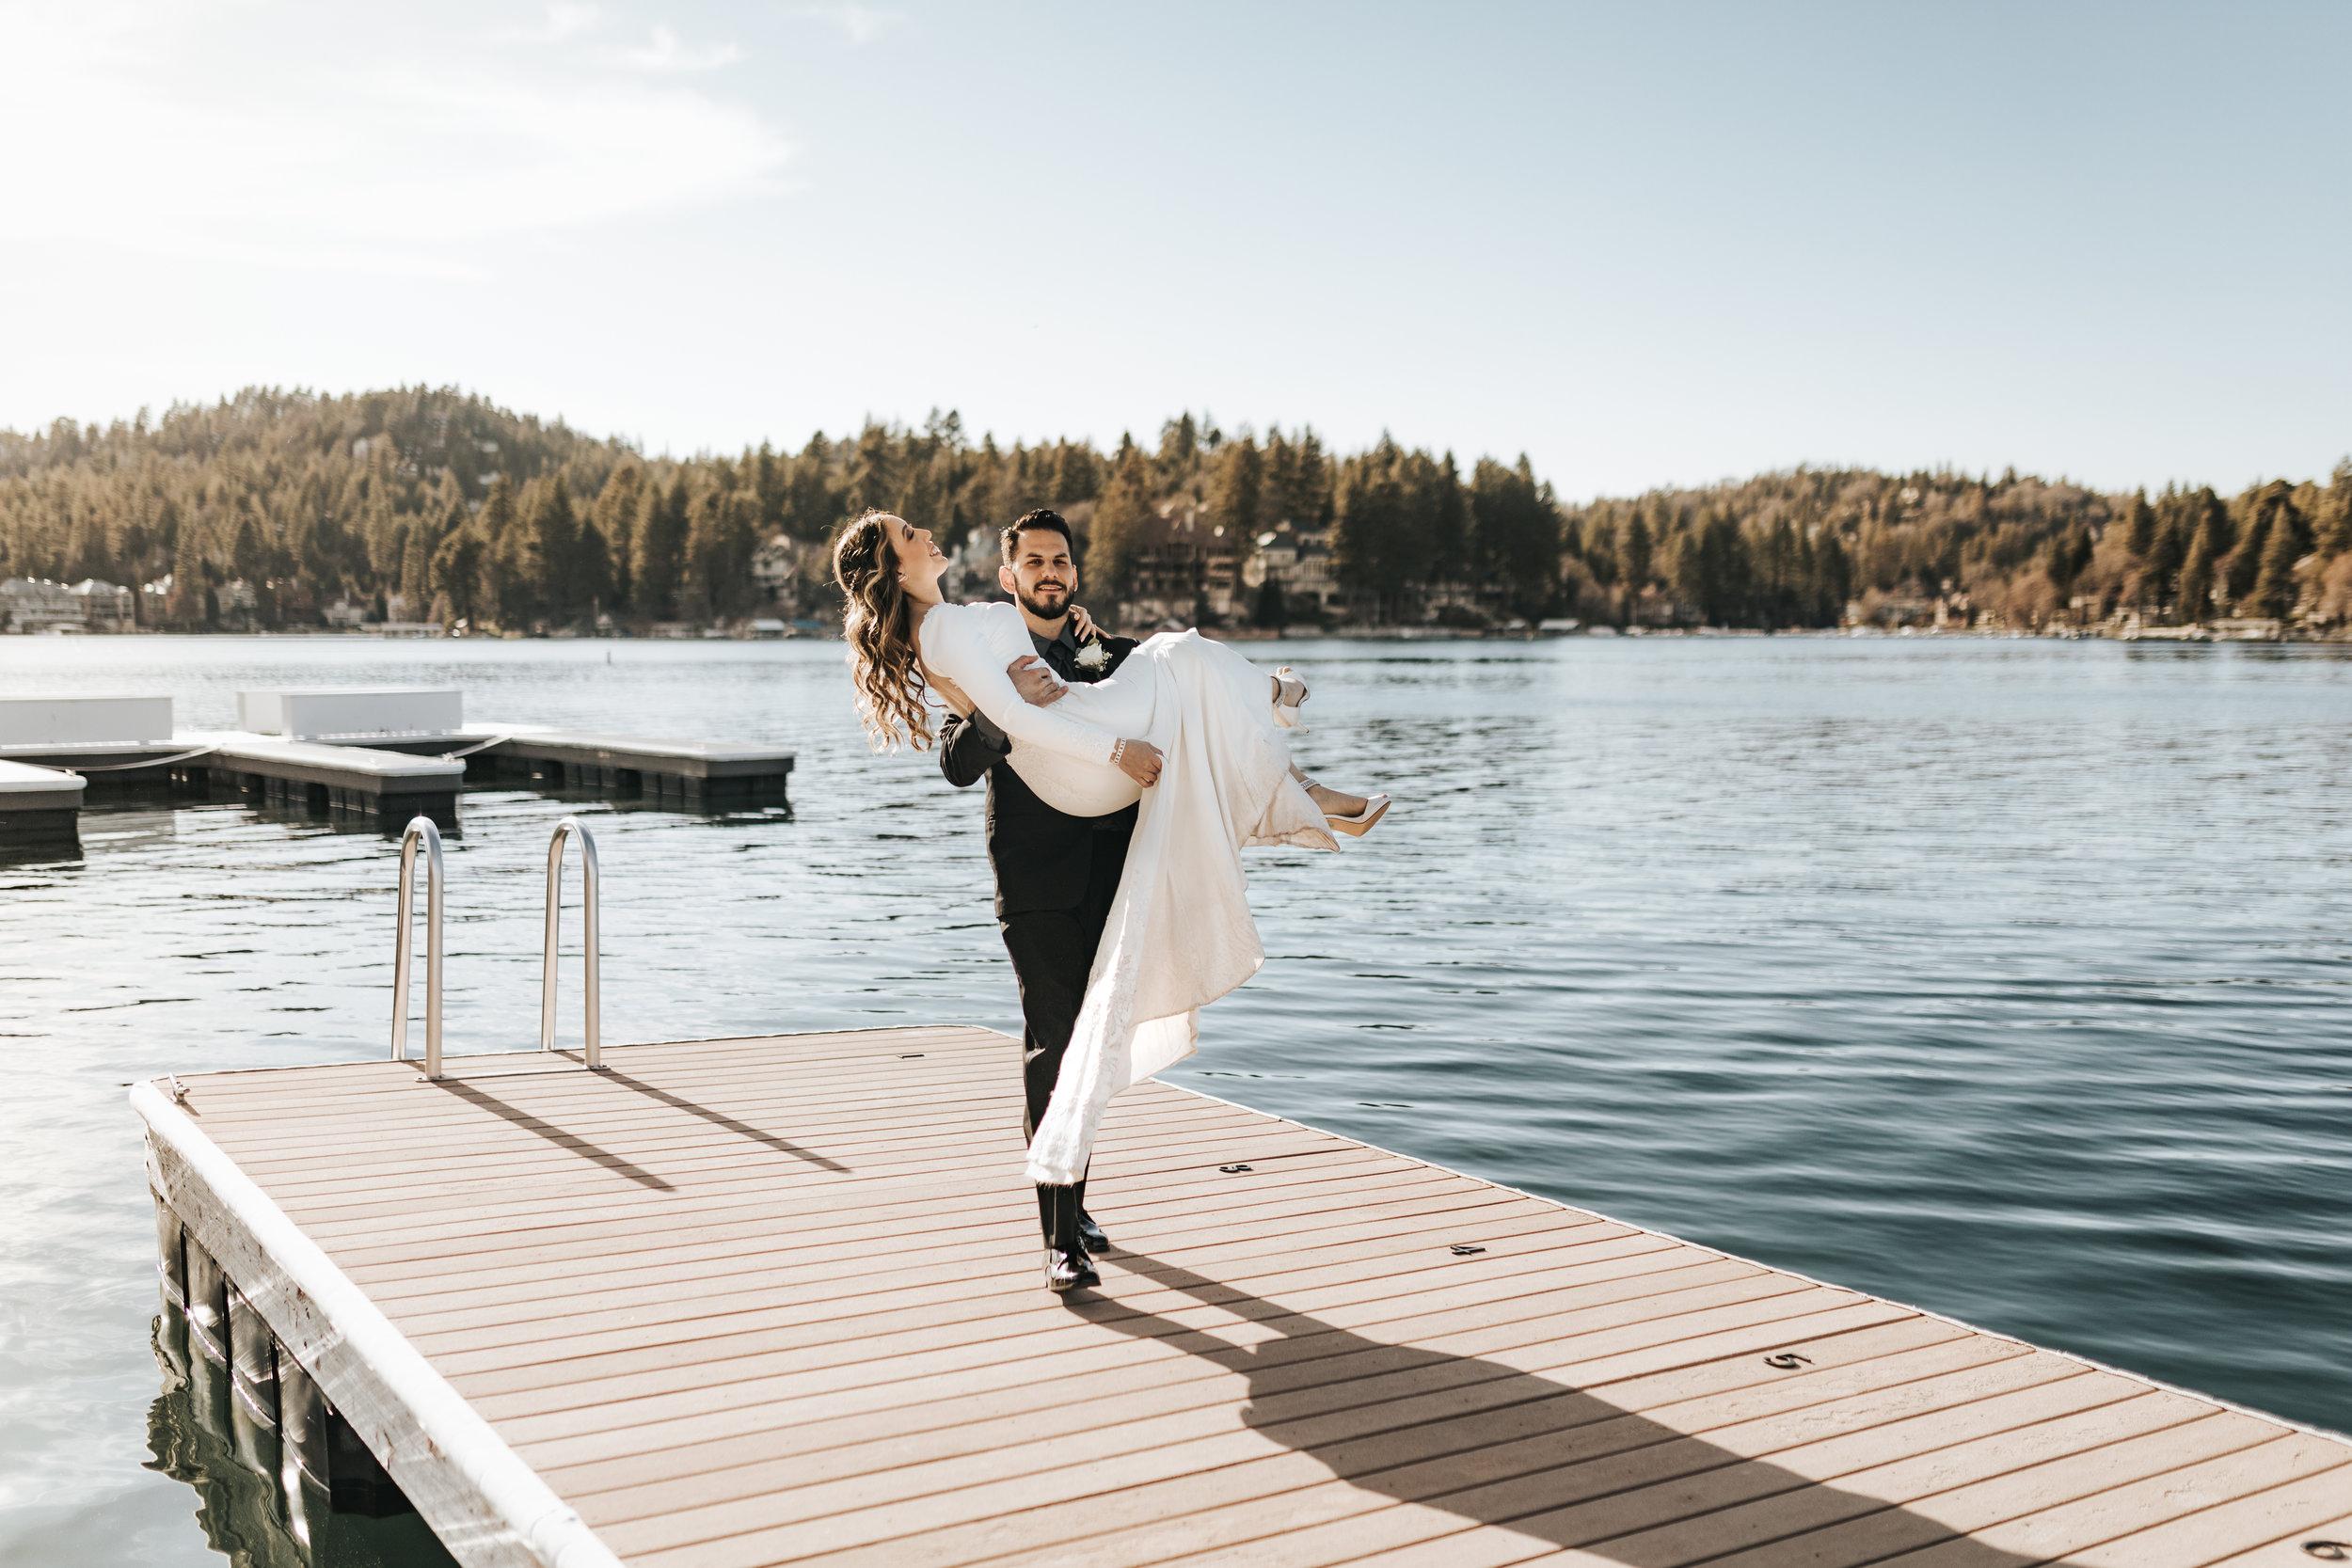 K+K Lake arrowhead intimate wedding (22).jpg